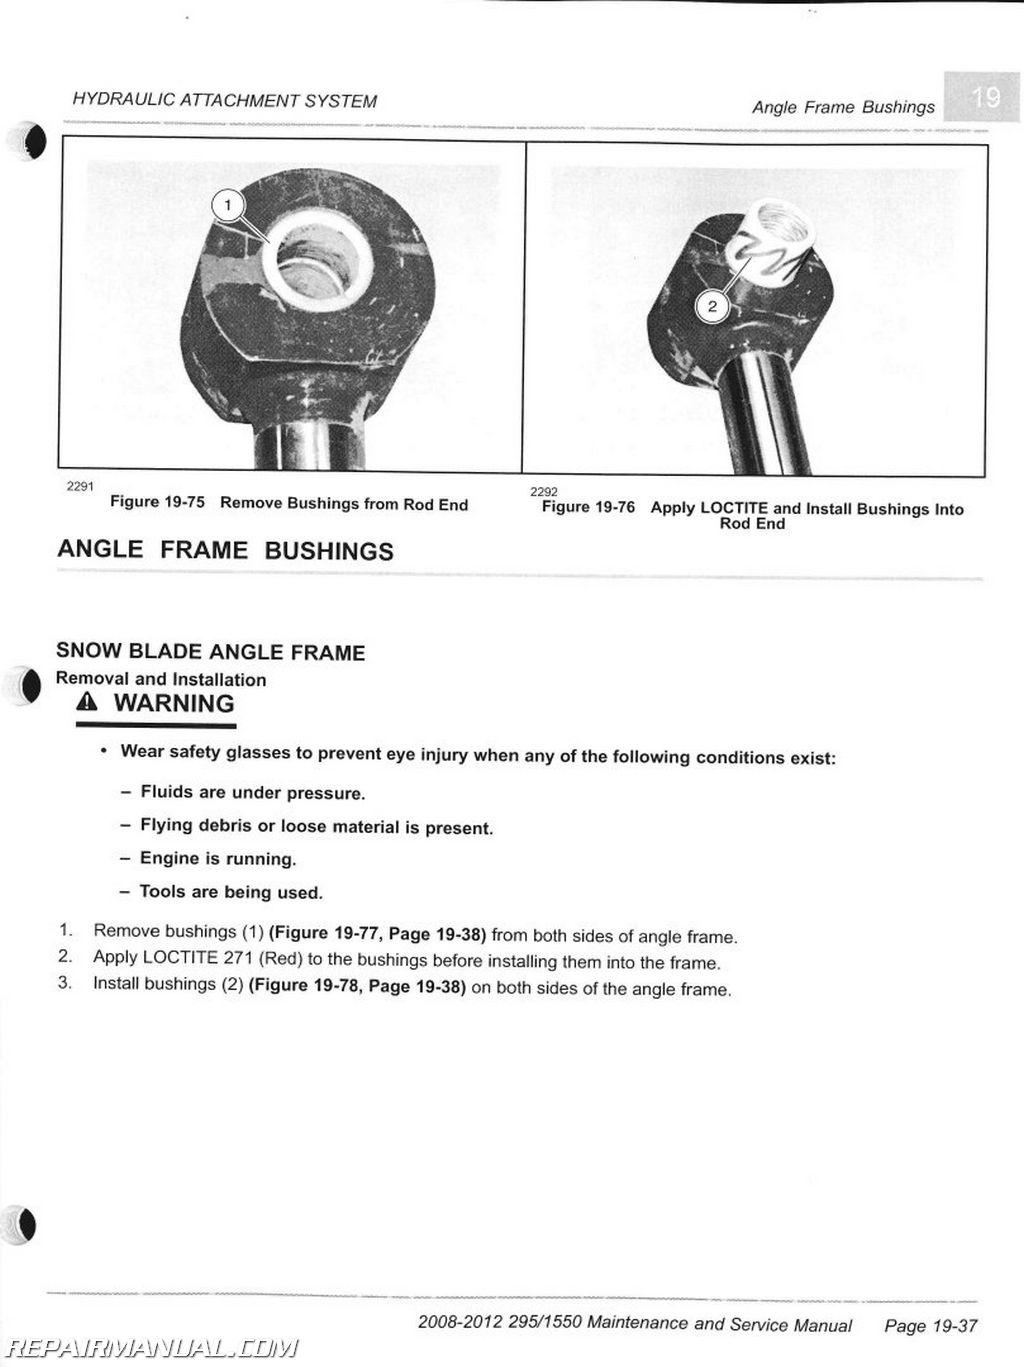 Club car xrt 1550 parts manual pdf 3